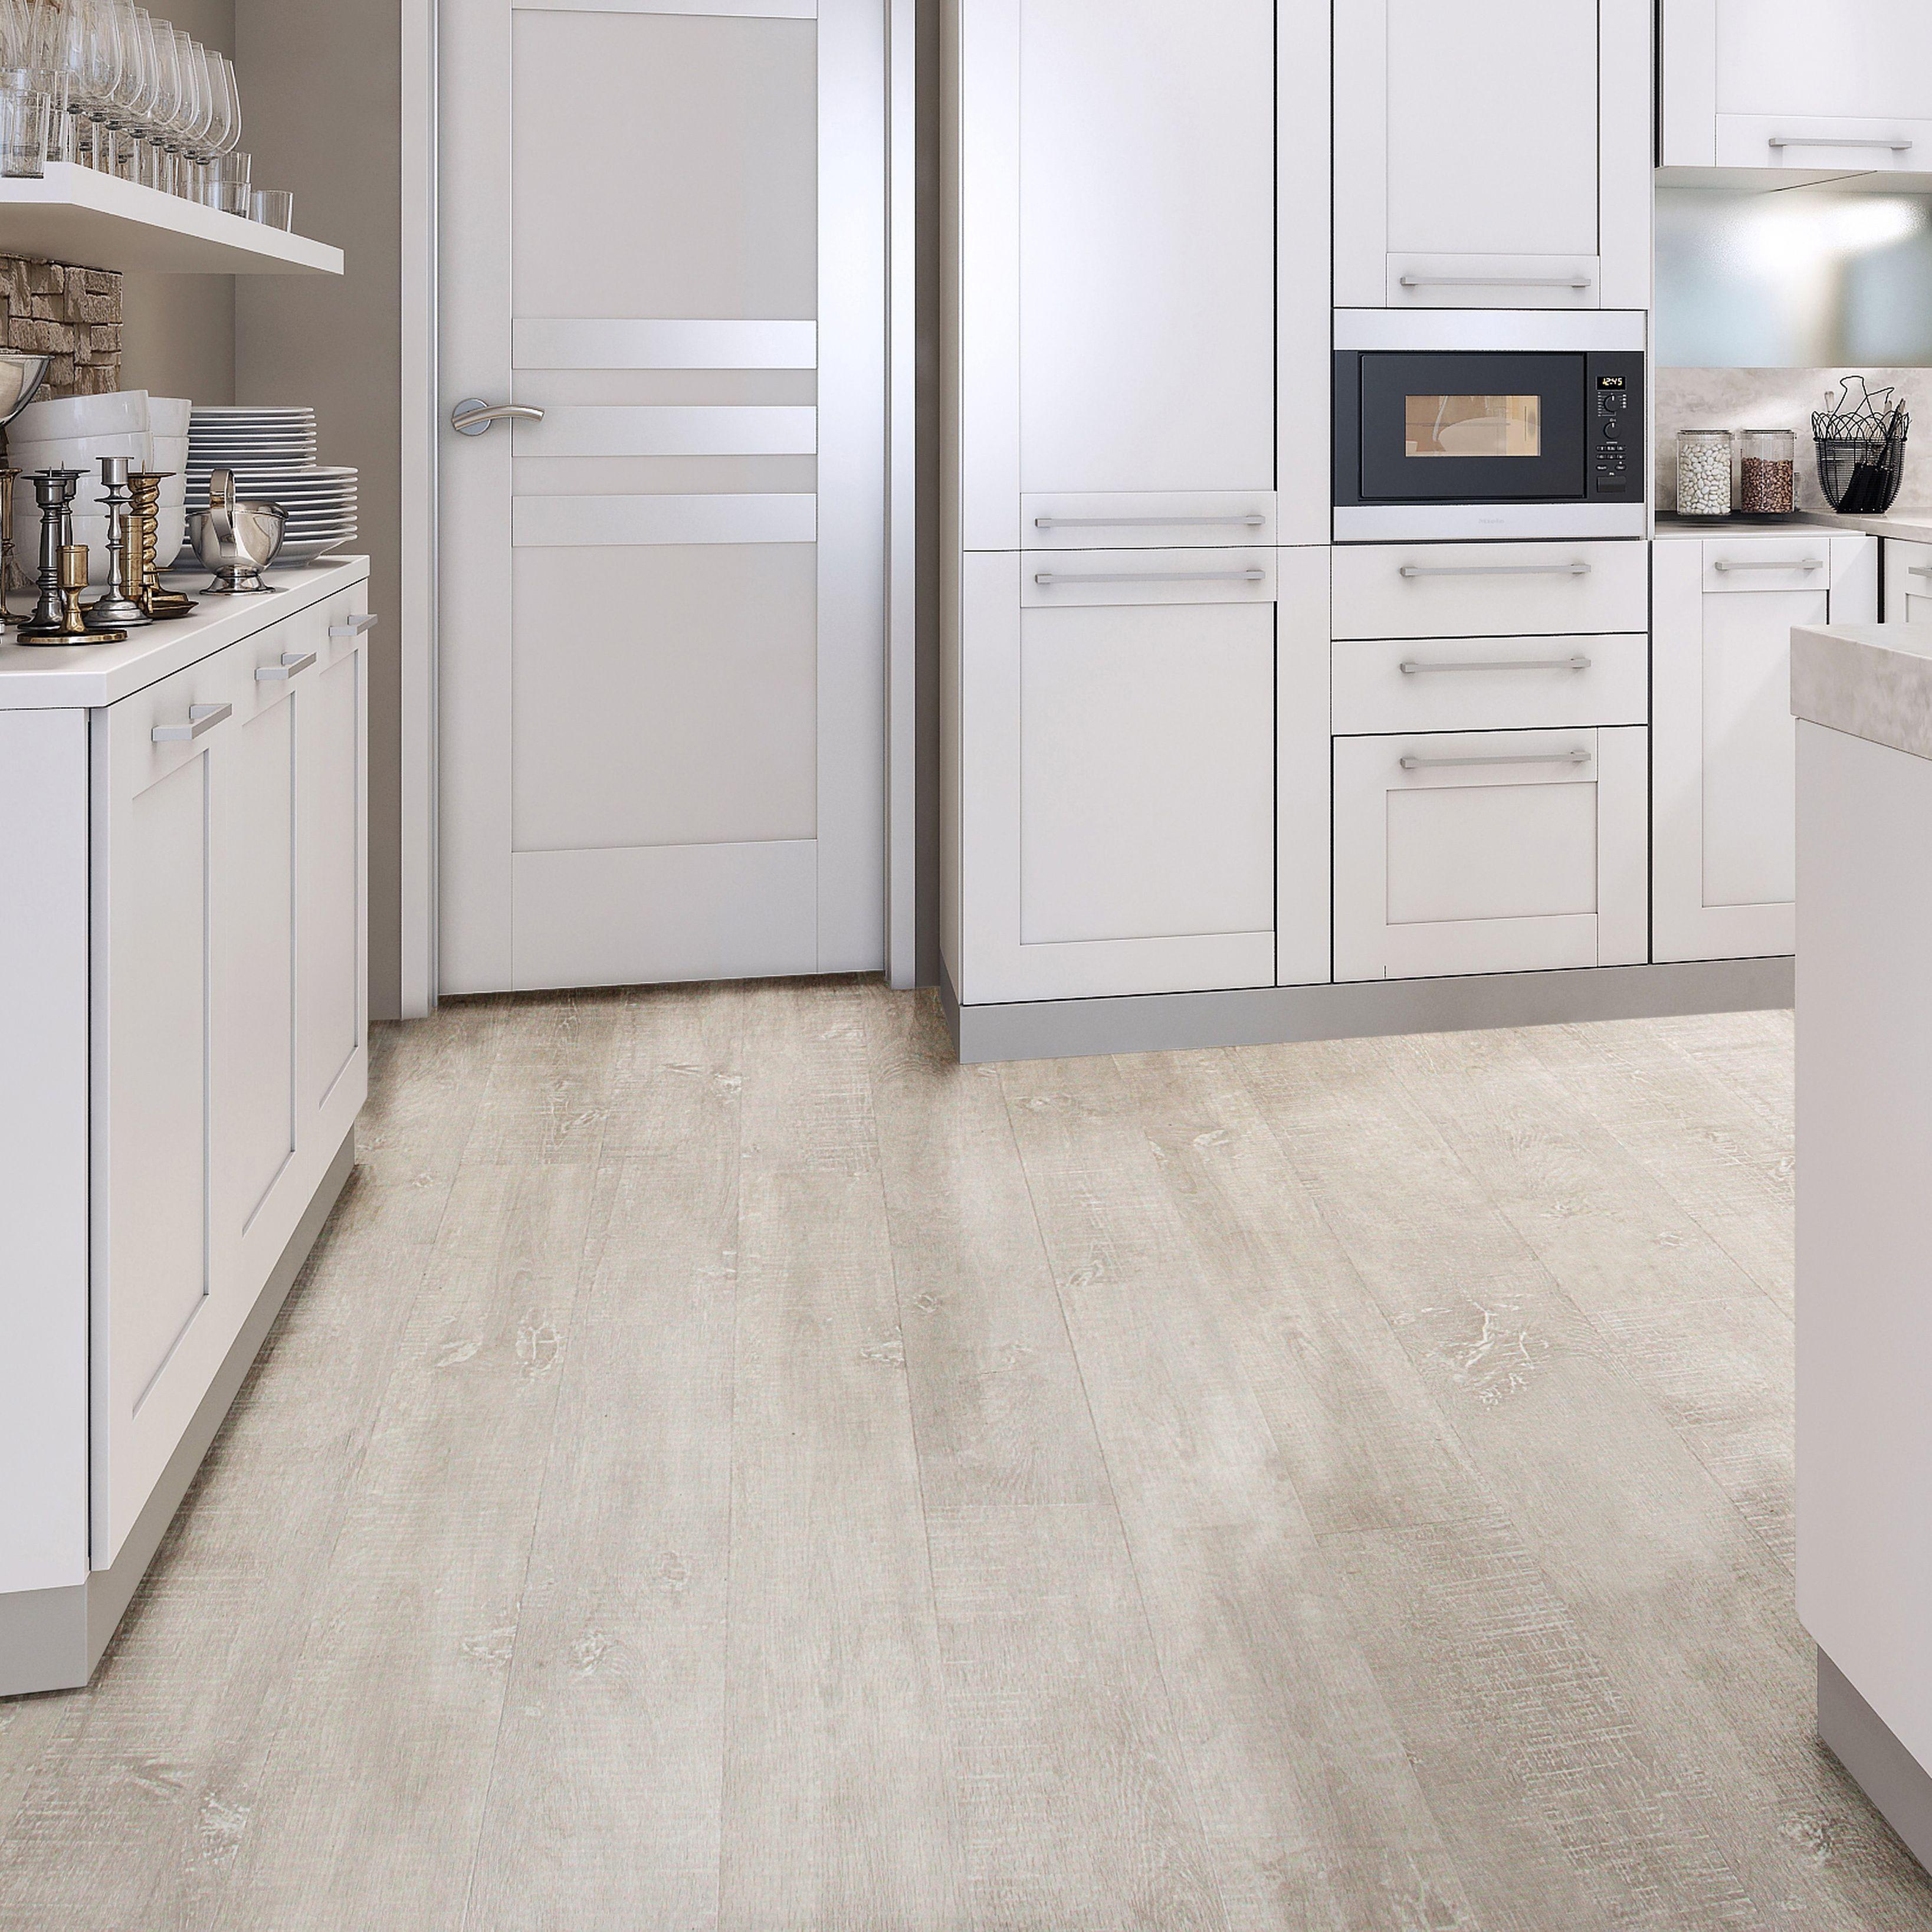 45 Modern Kitchen Laminate Flooring Mold Decornish Dot Com Laminate Flooring In Kitchen Waterproof Laminate Flooring Luxury Vinyl Click Flooring